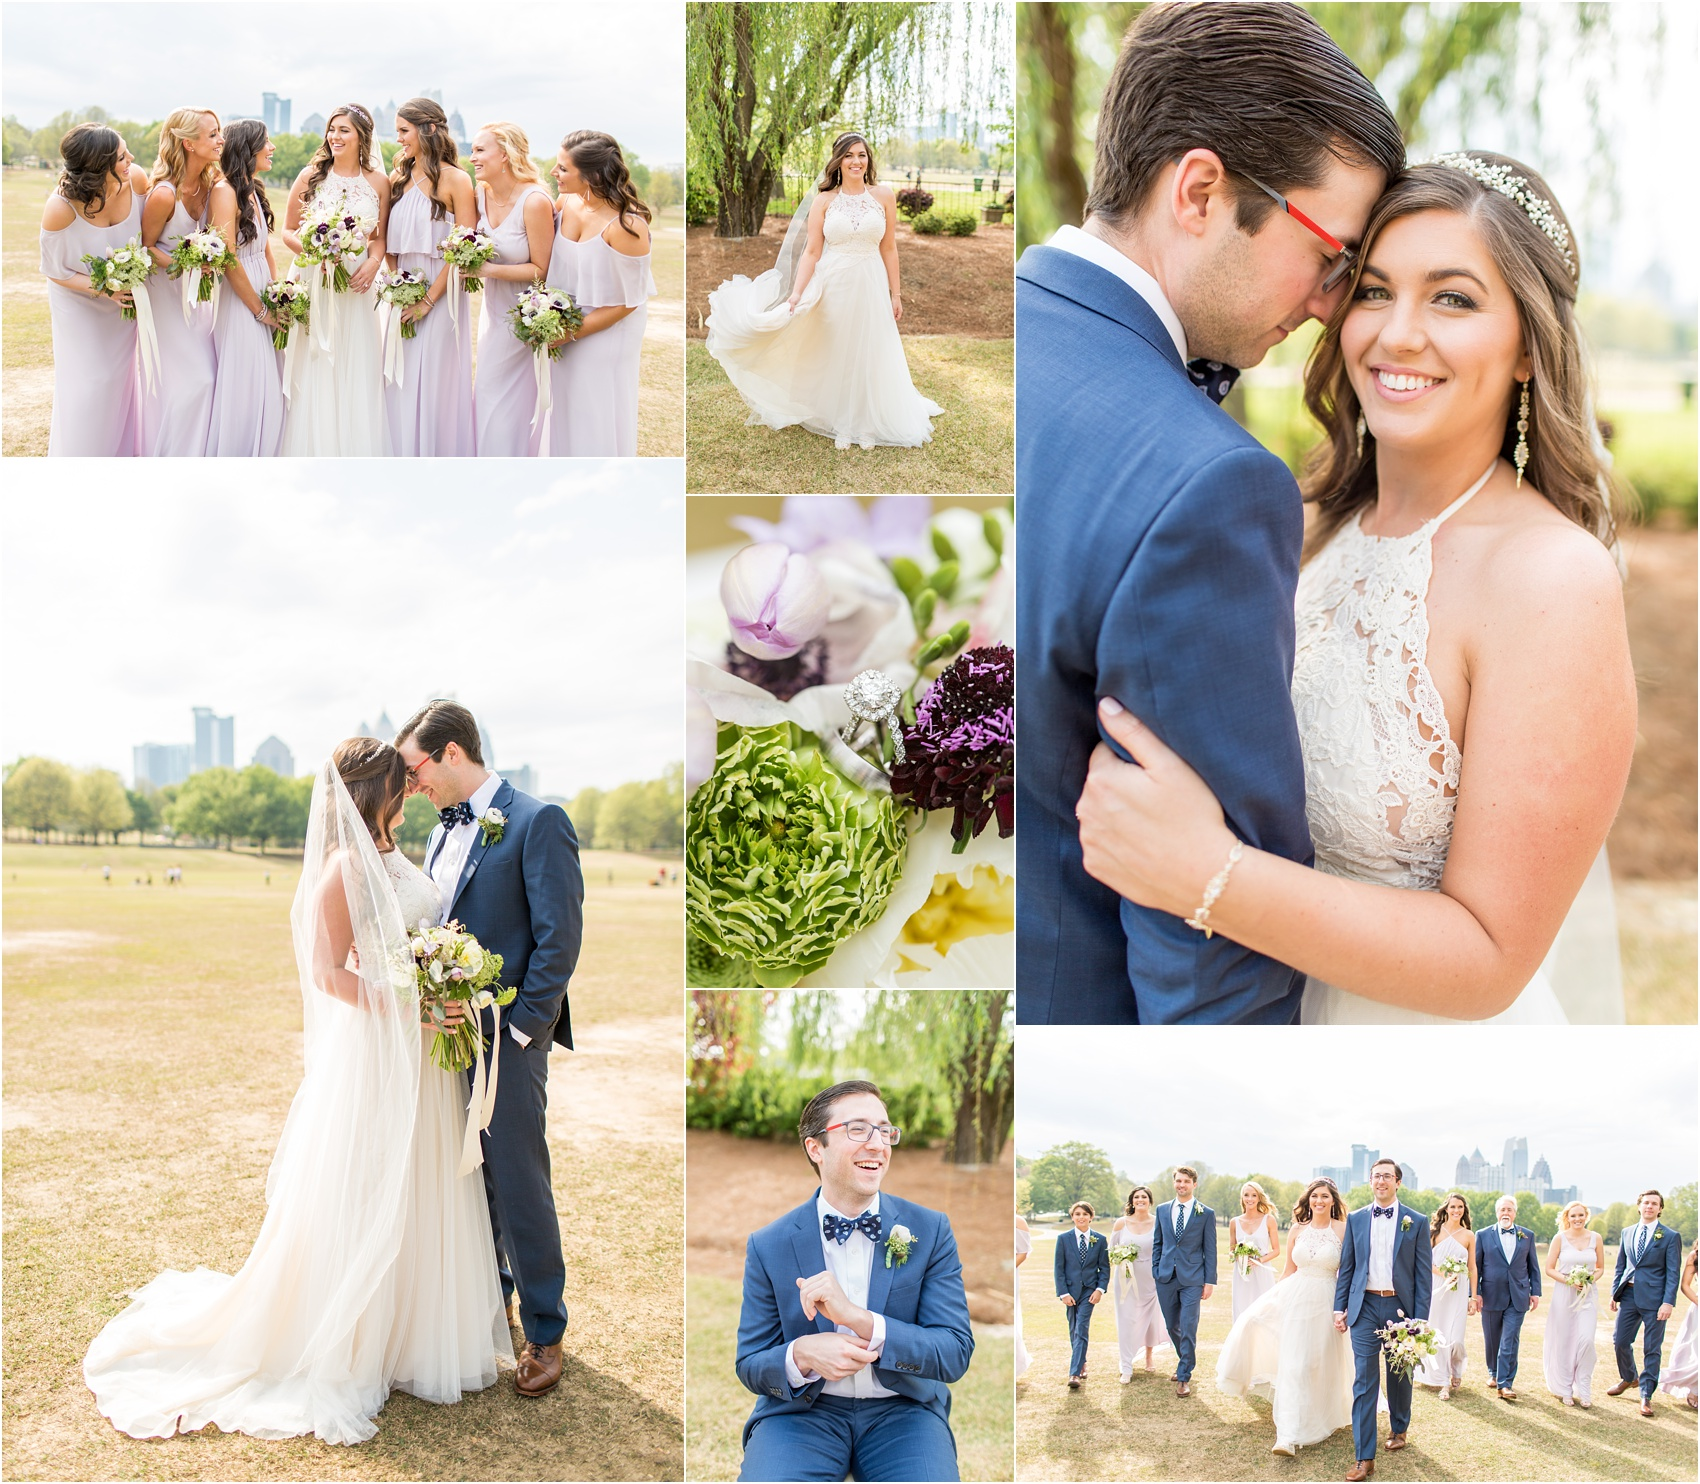 Savannah Eve Photography- Groseclose Wedding- Sneak Peek-17.jpg